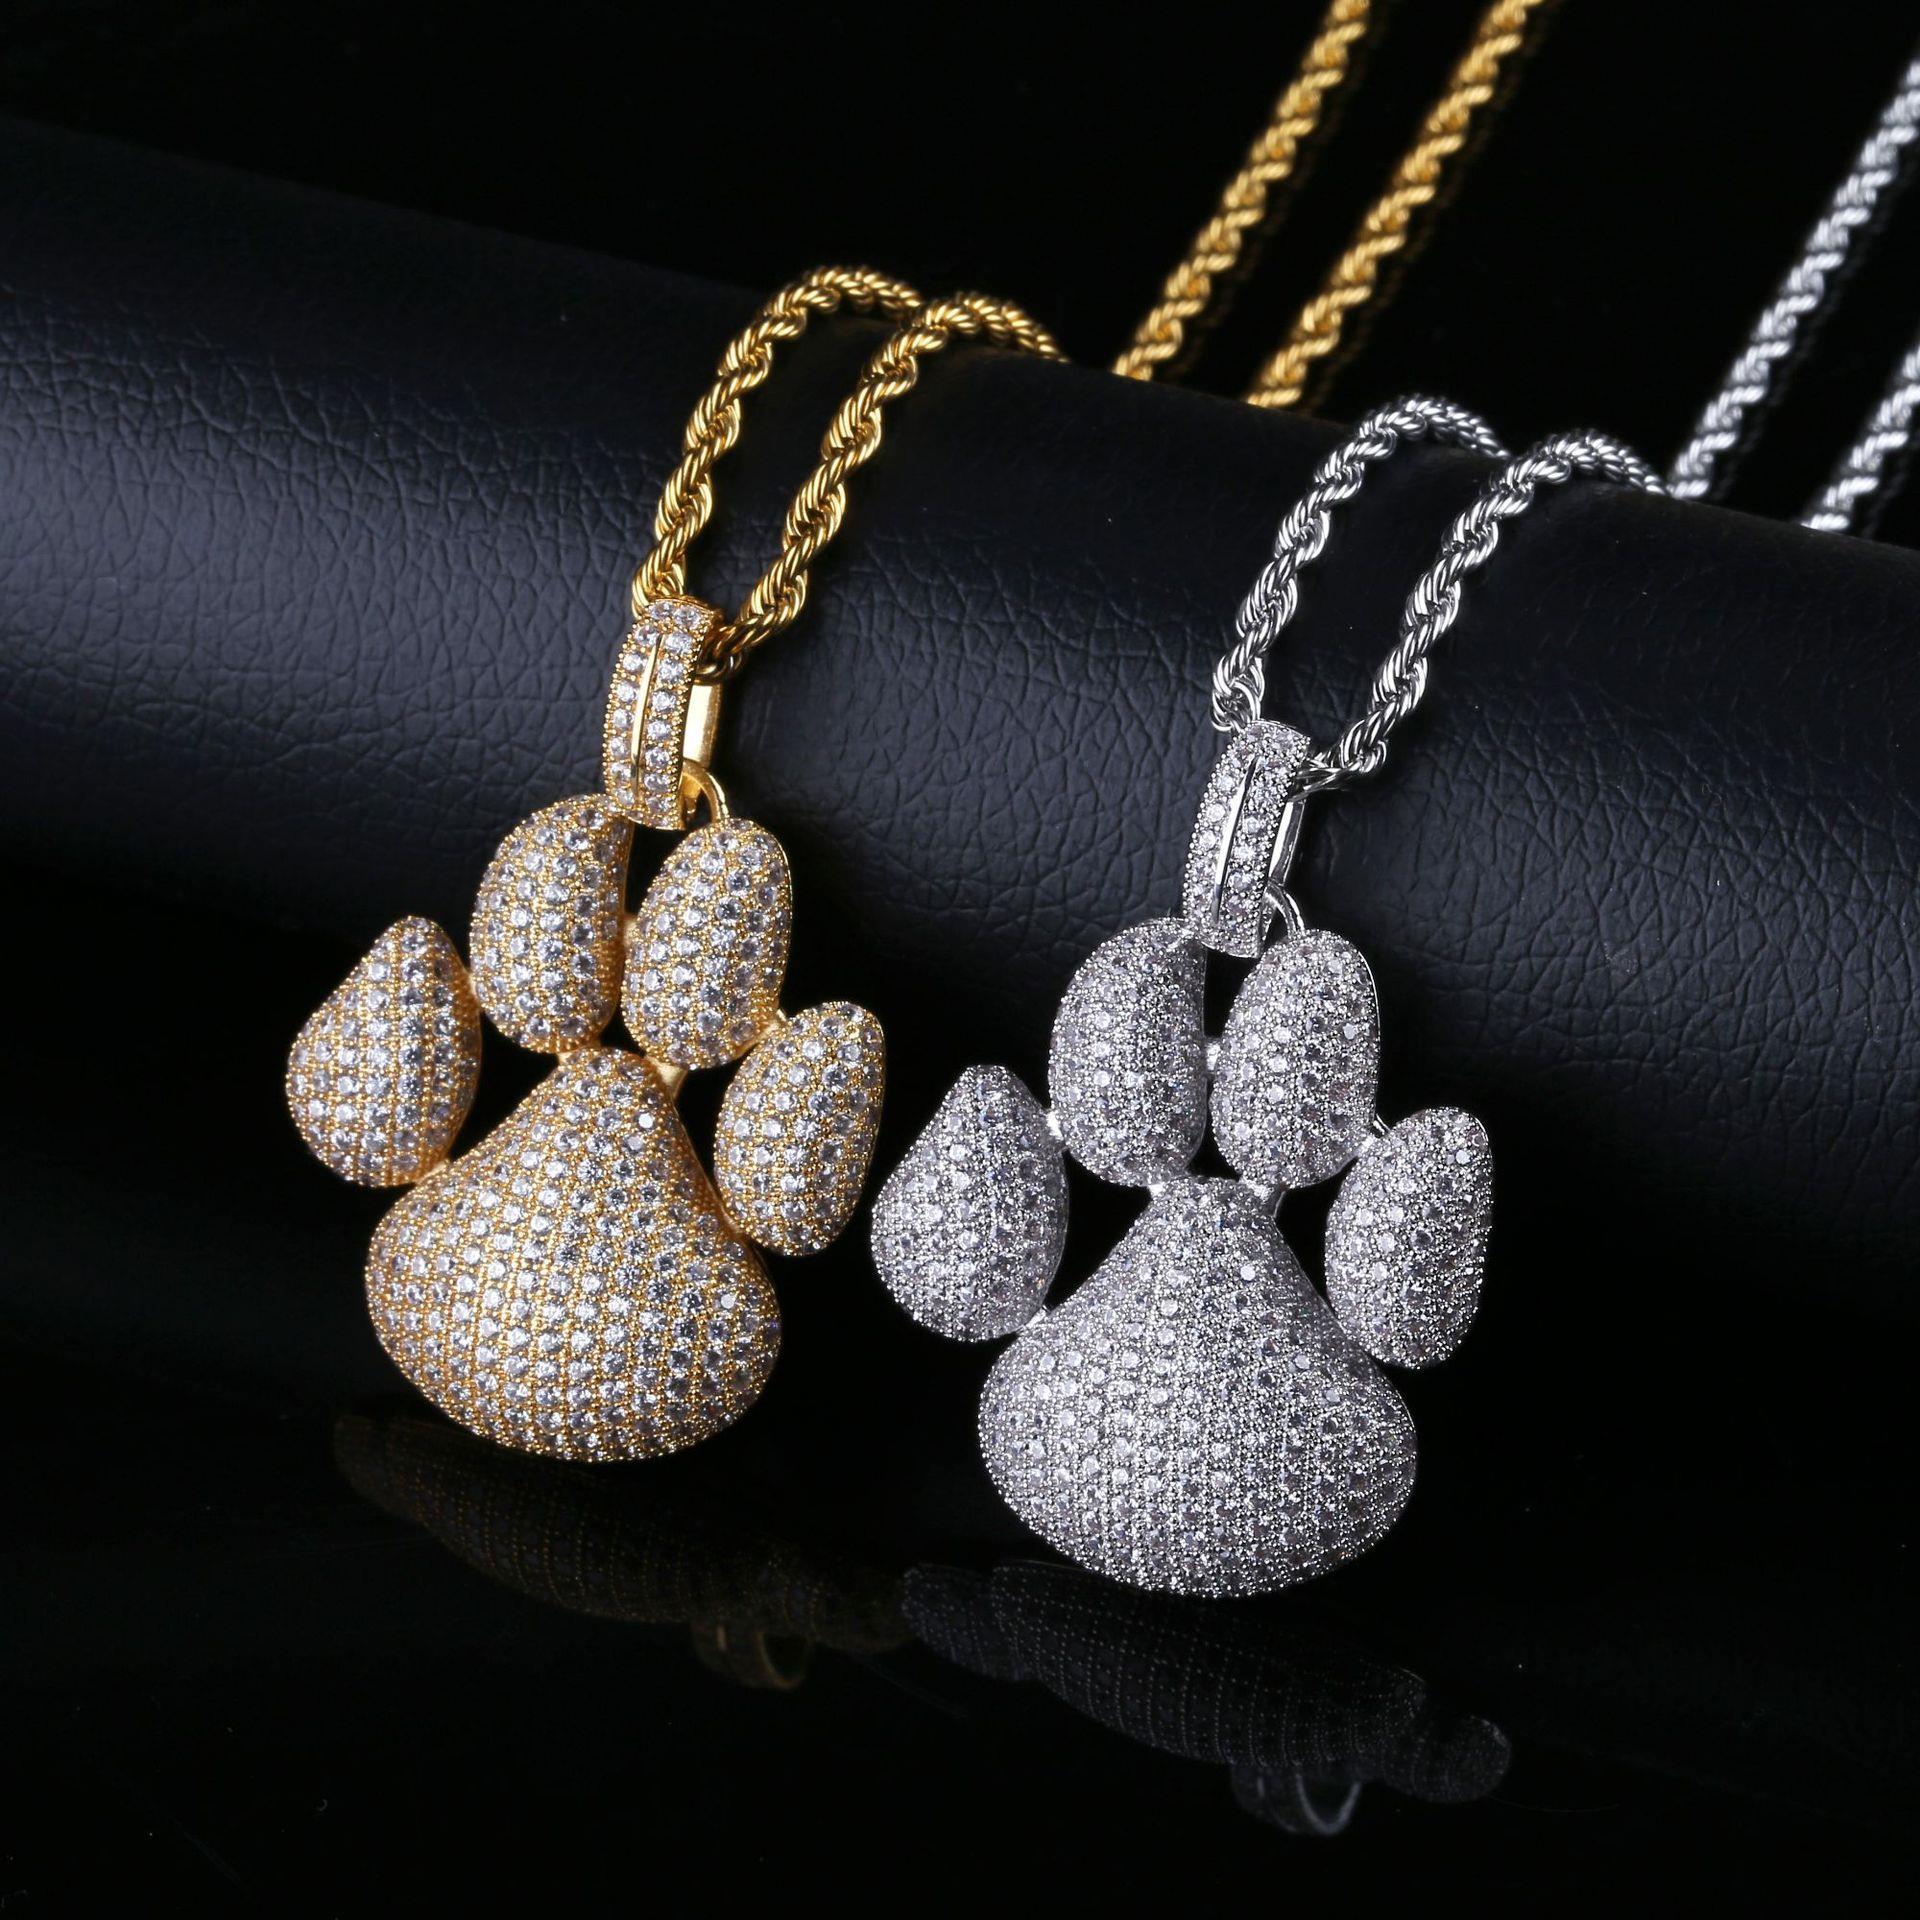 PersonalizedJewelryGifts Australia Necklace for Women and Girls Silver Charm Pendant Jewelry Australia Map Charm